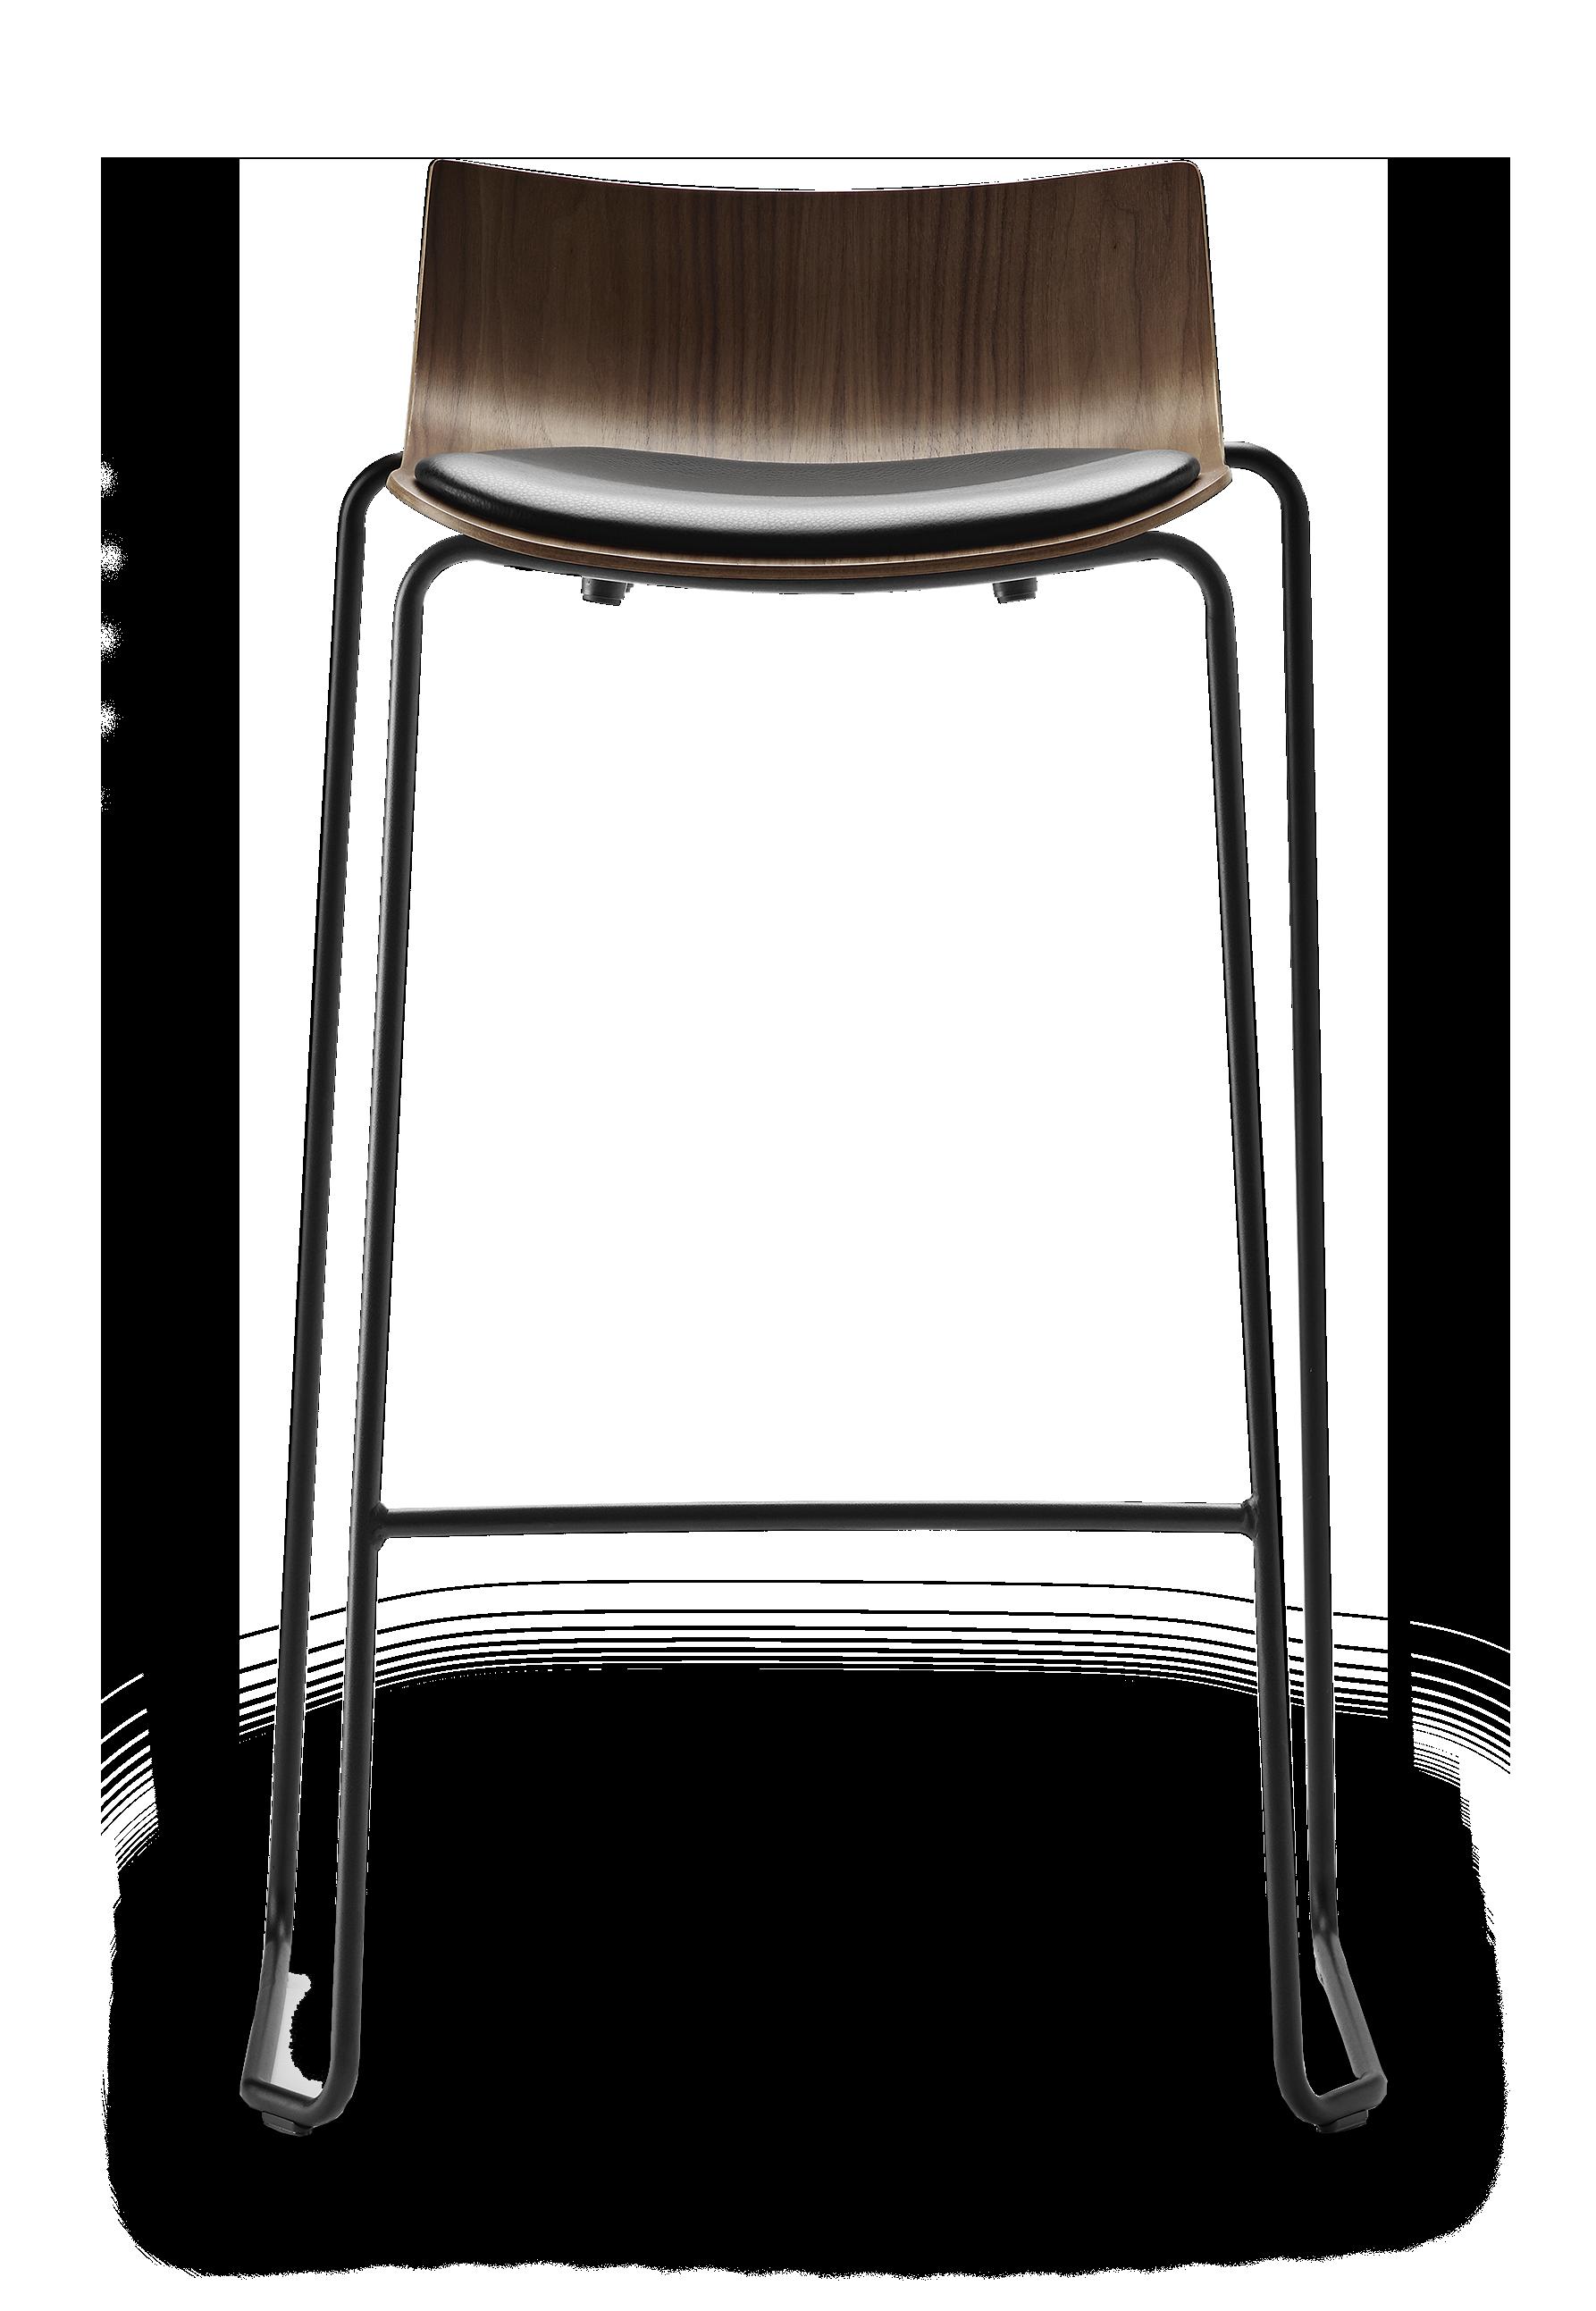 BA004S |  Preludia Bar Stool upholstered seat